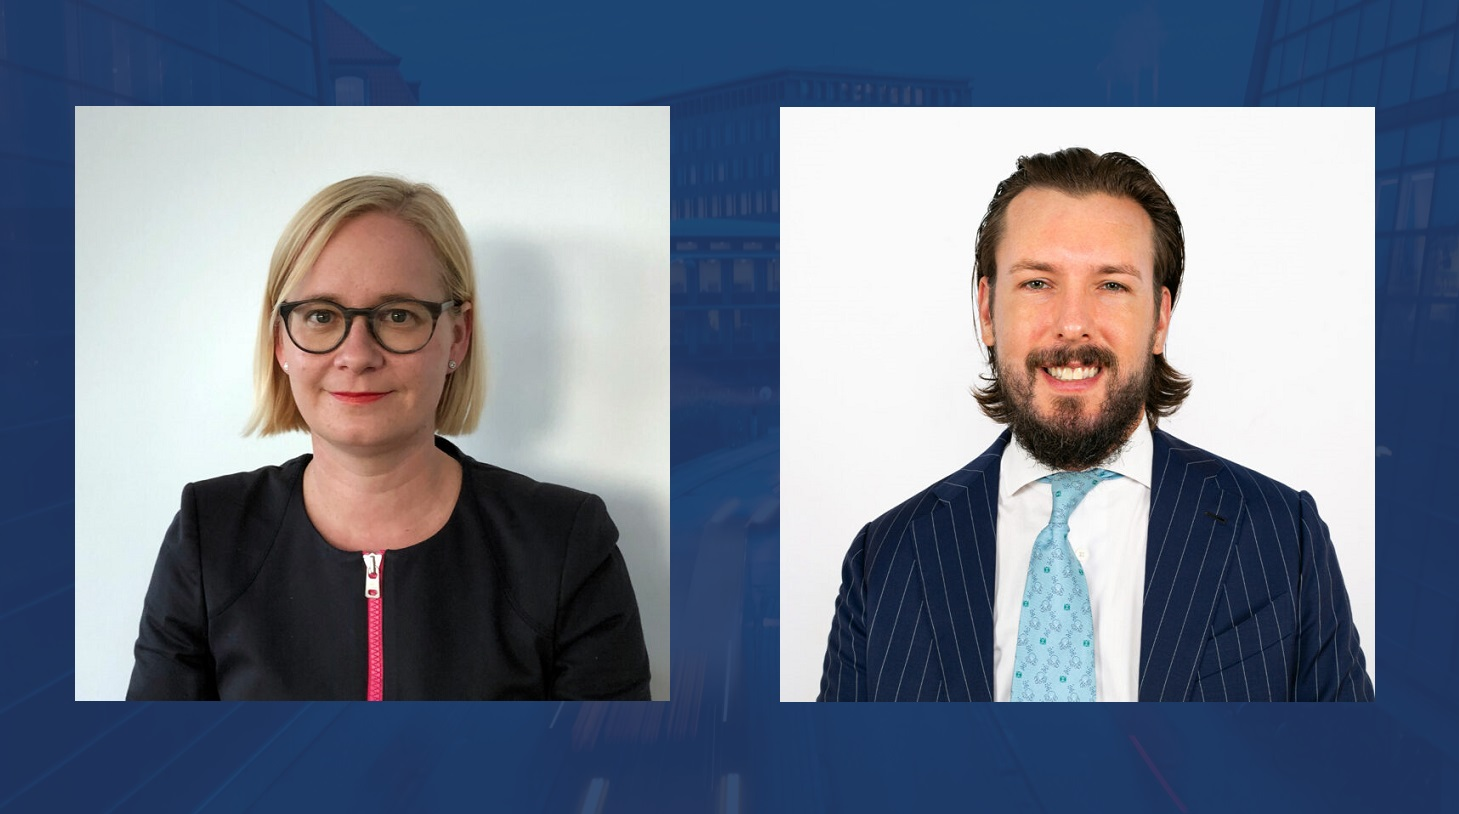 Signium announces Stéphanie Engels and Alexander de Freitas as co-leaders of Technology Practice Group